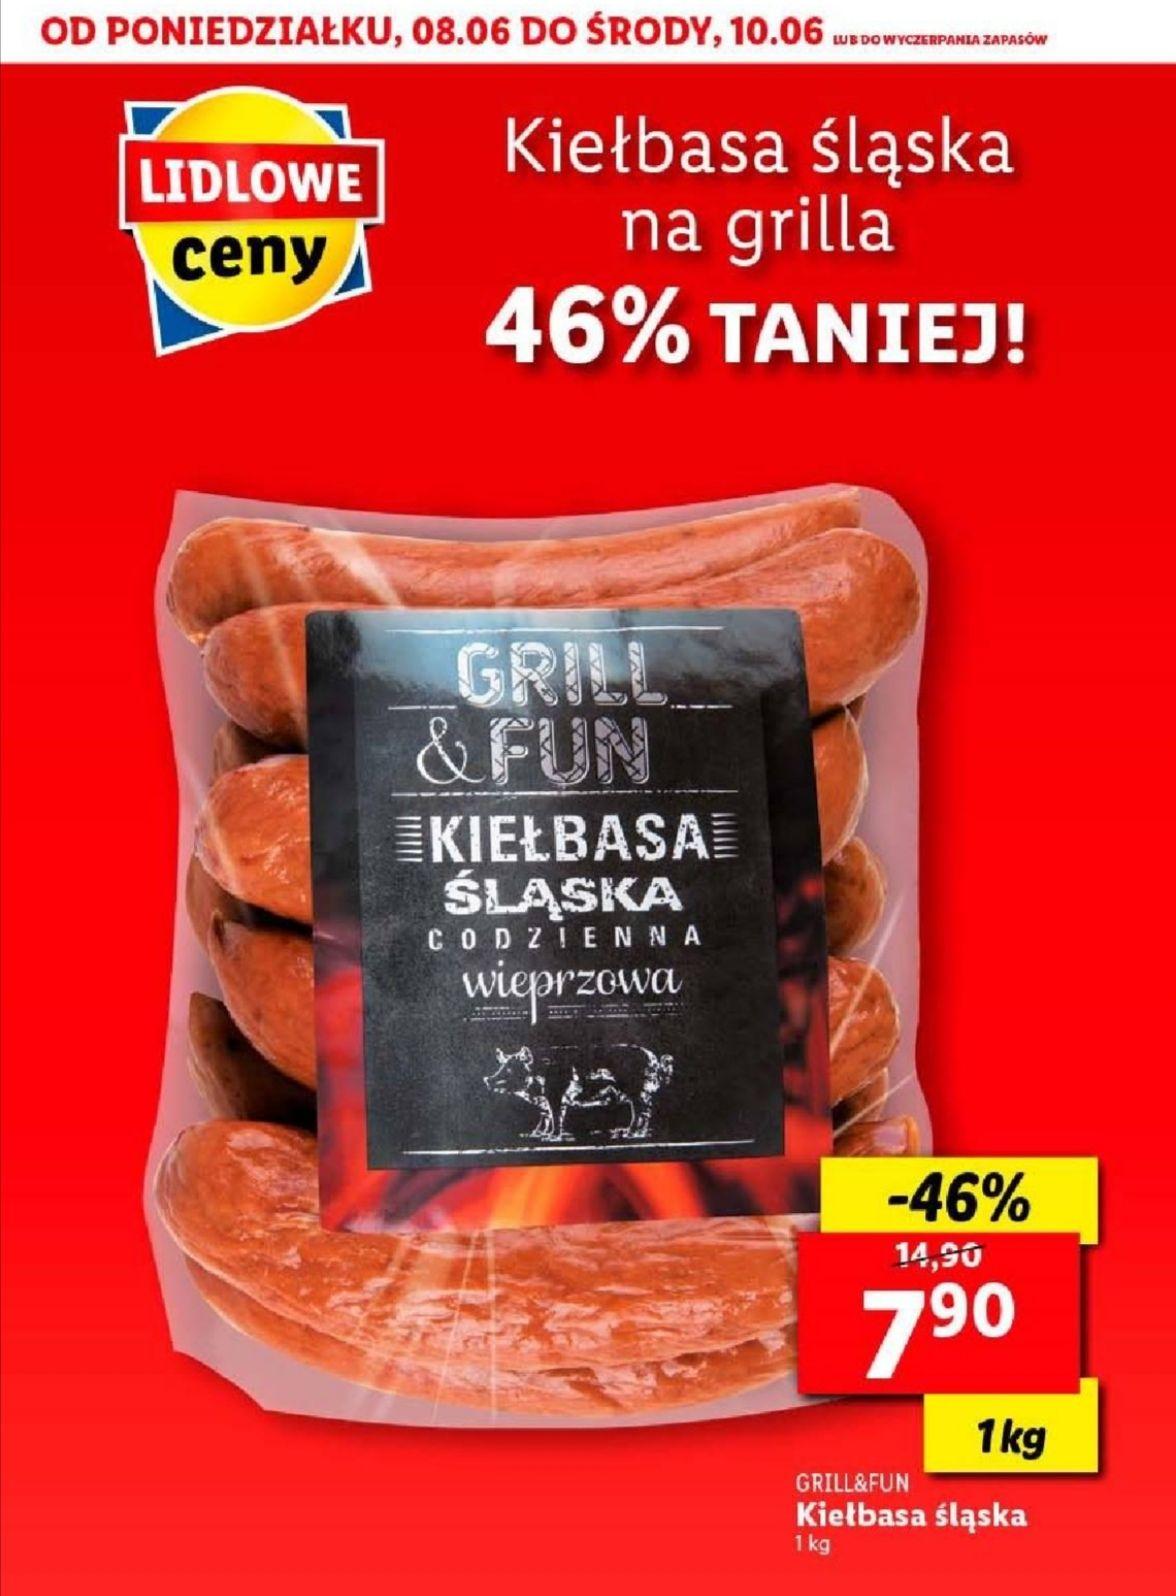 Kiełbasa Śląska 1 kg. Lidl